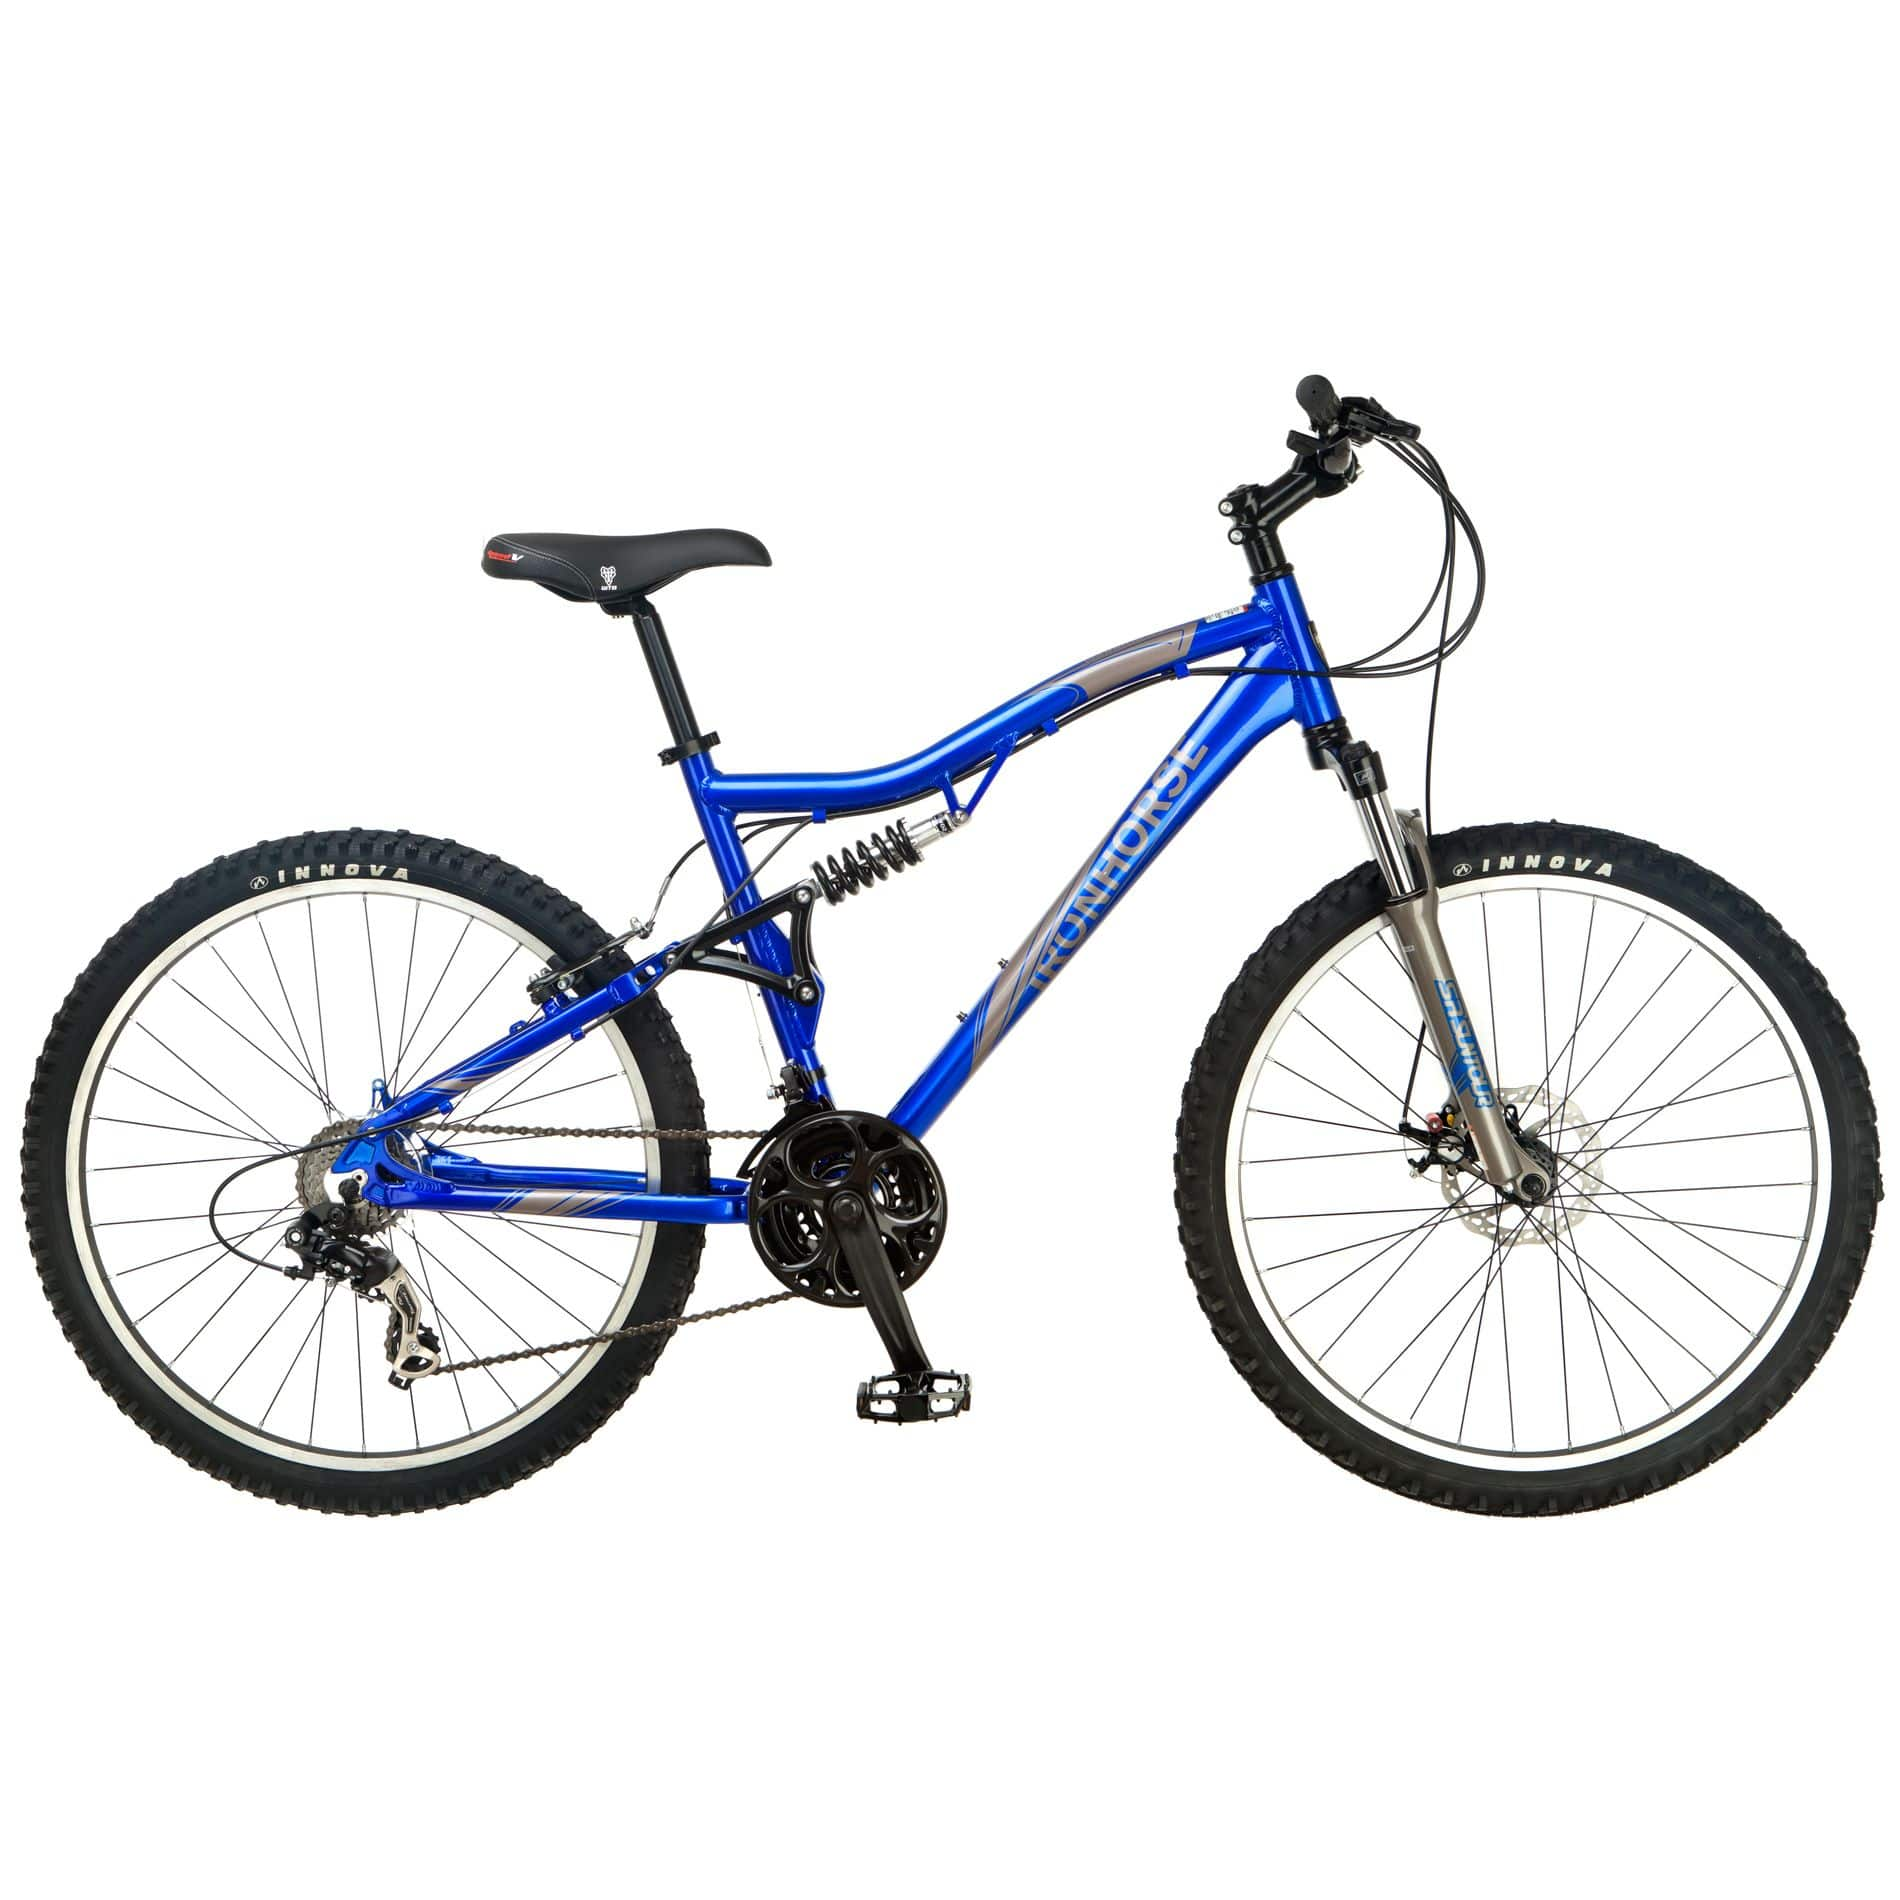 "26"" Iron Horse Men's Warrior 3.1 Bike - $249 + Free Shipping/pickup"